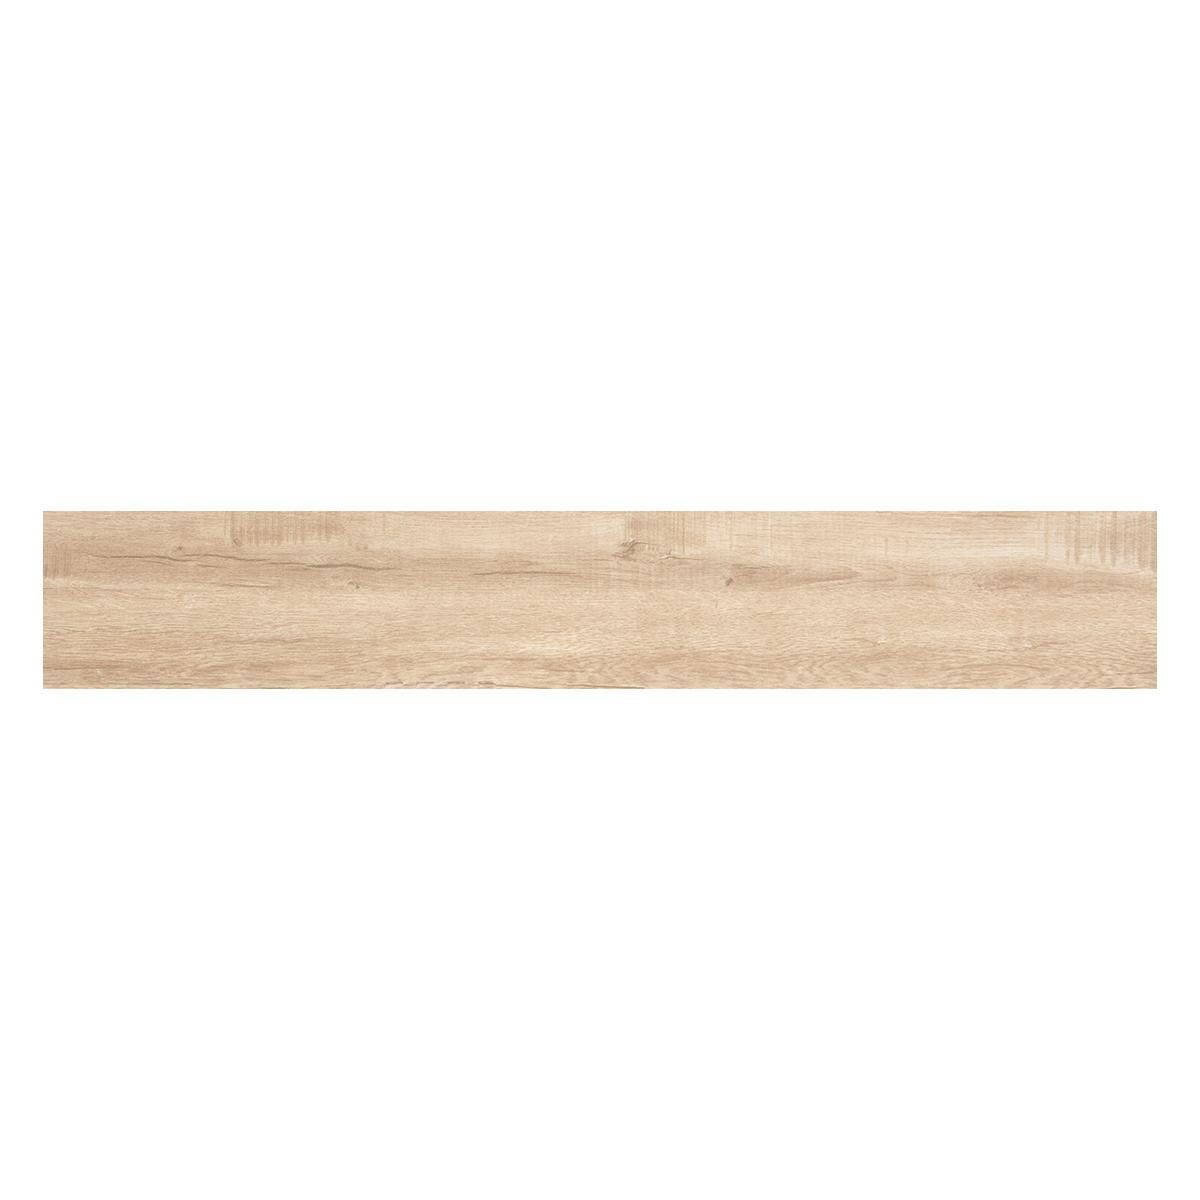 Piso Laminado Country Miel Mate - 19.9X121.5 - 2.90 m2